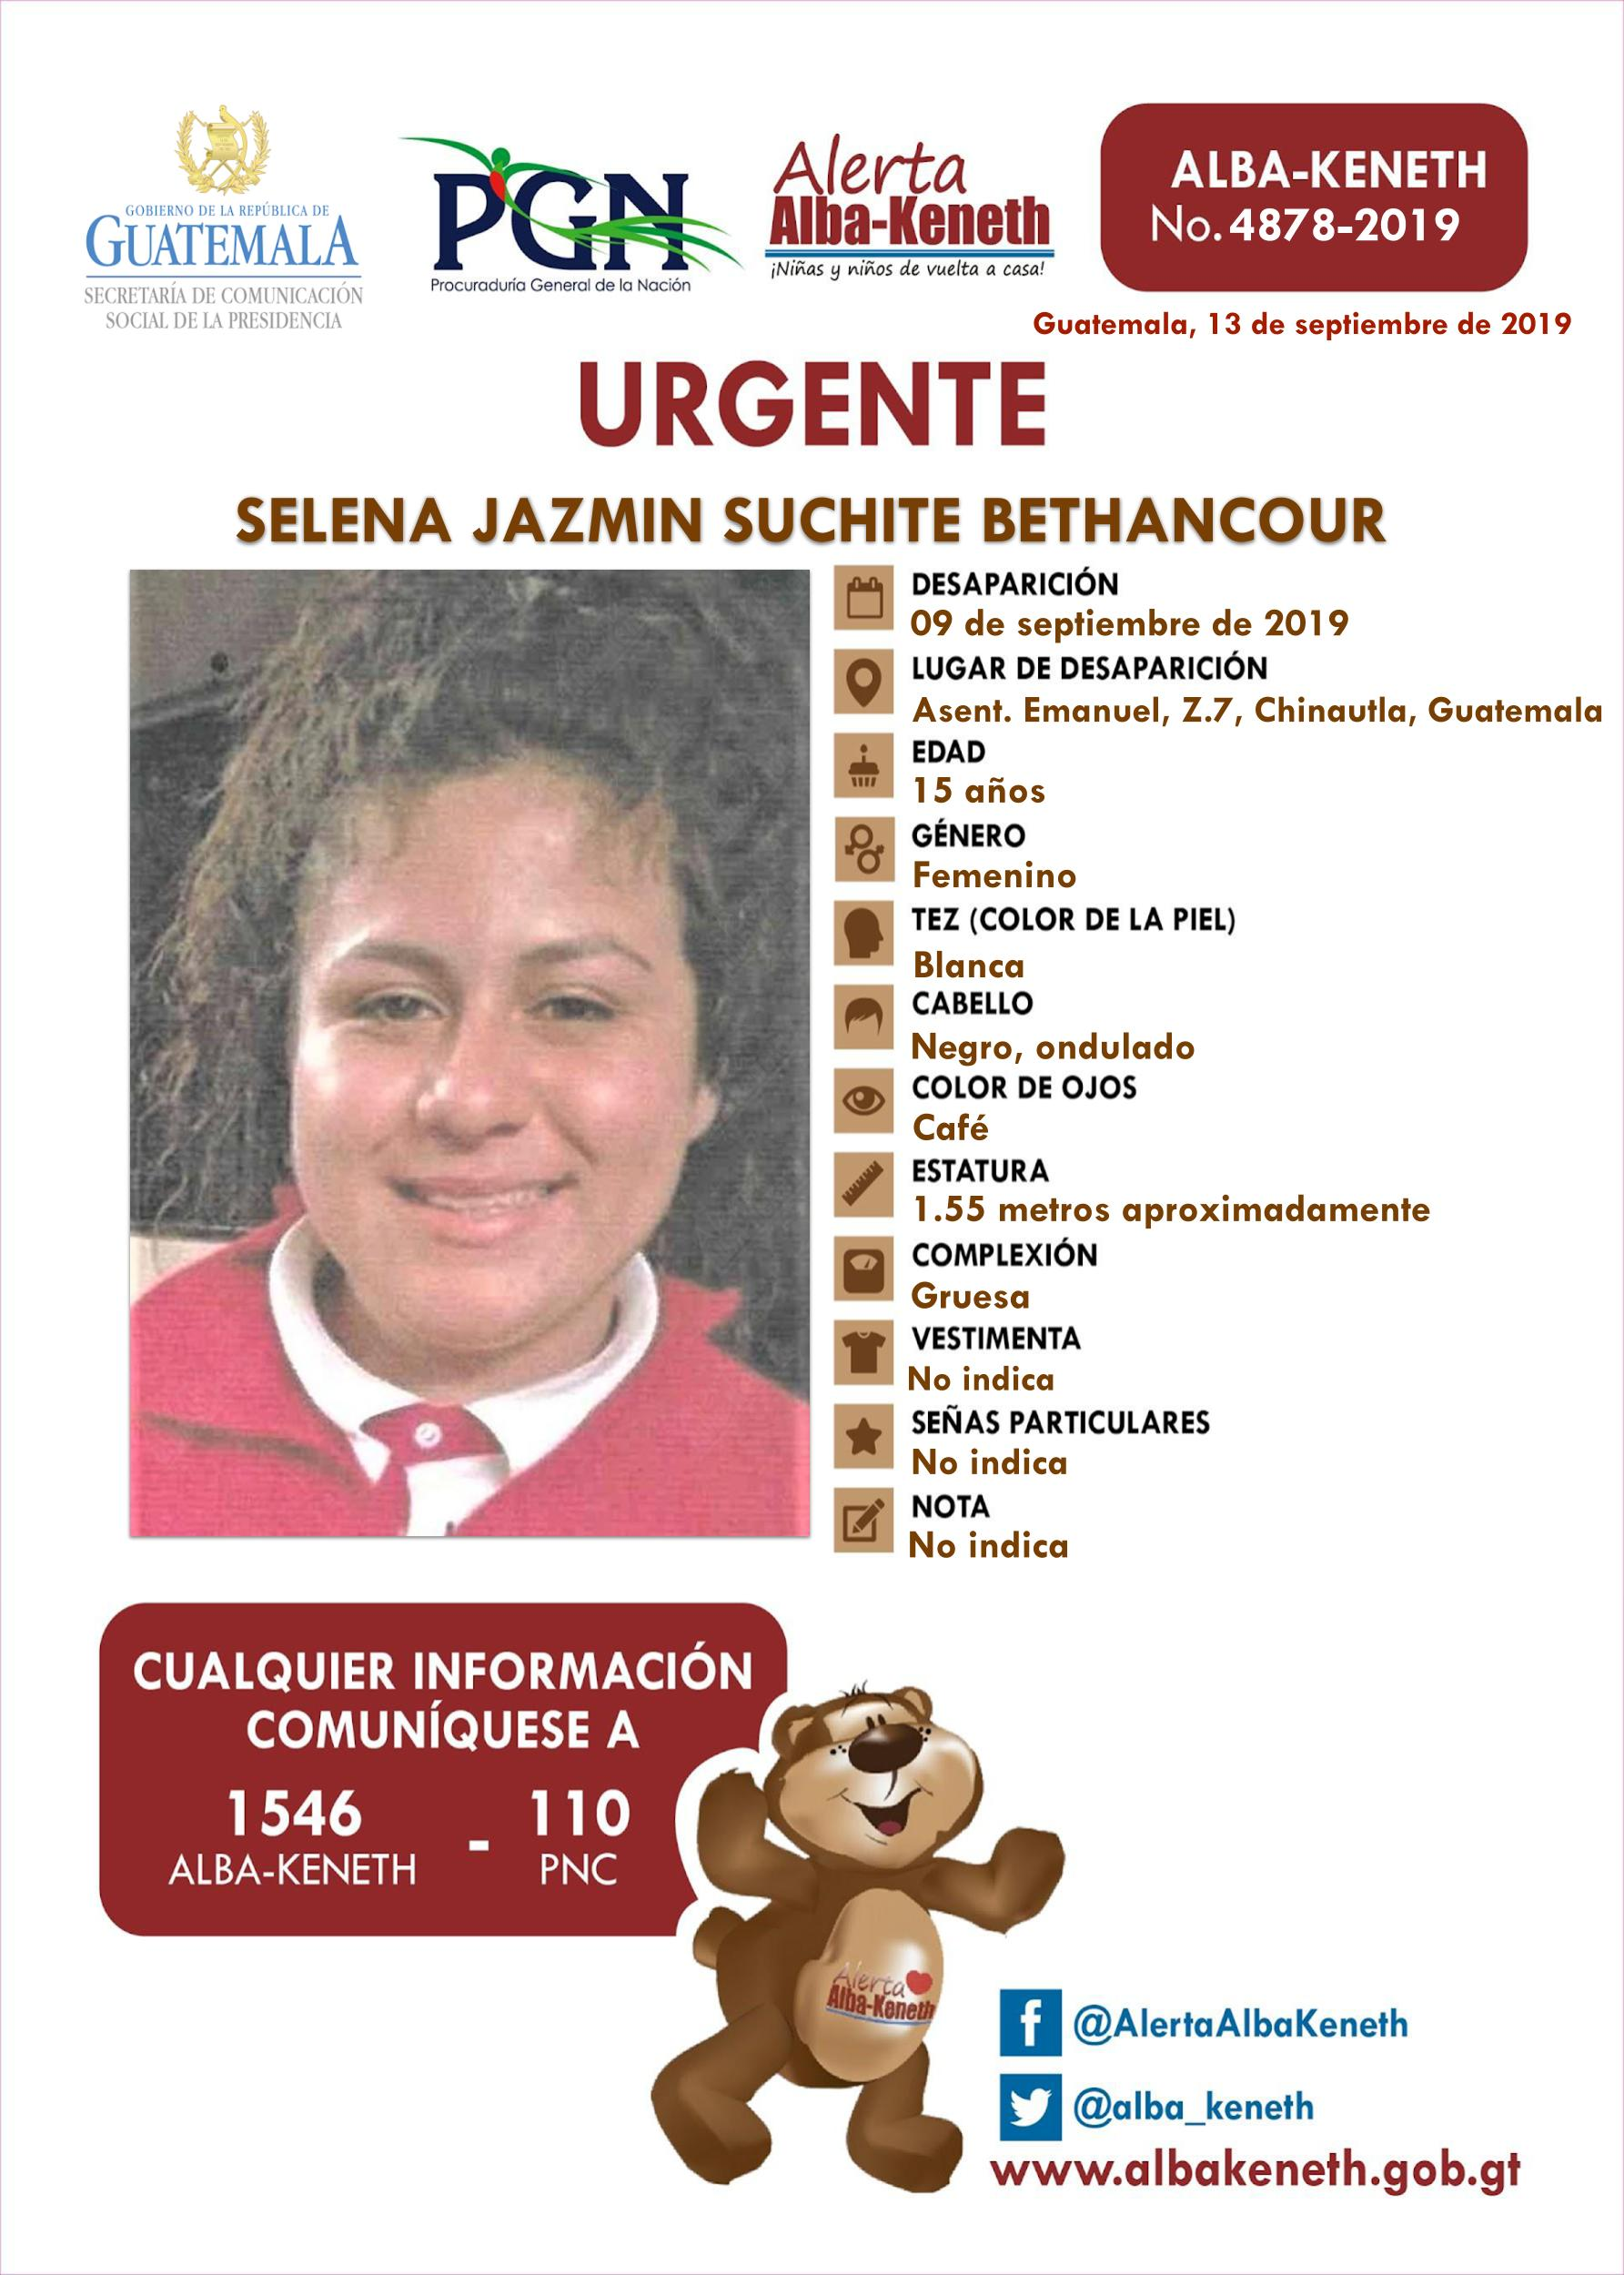 Selena Jazmin Suchite Bethancour